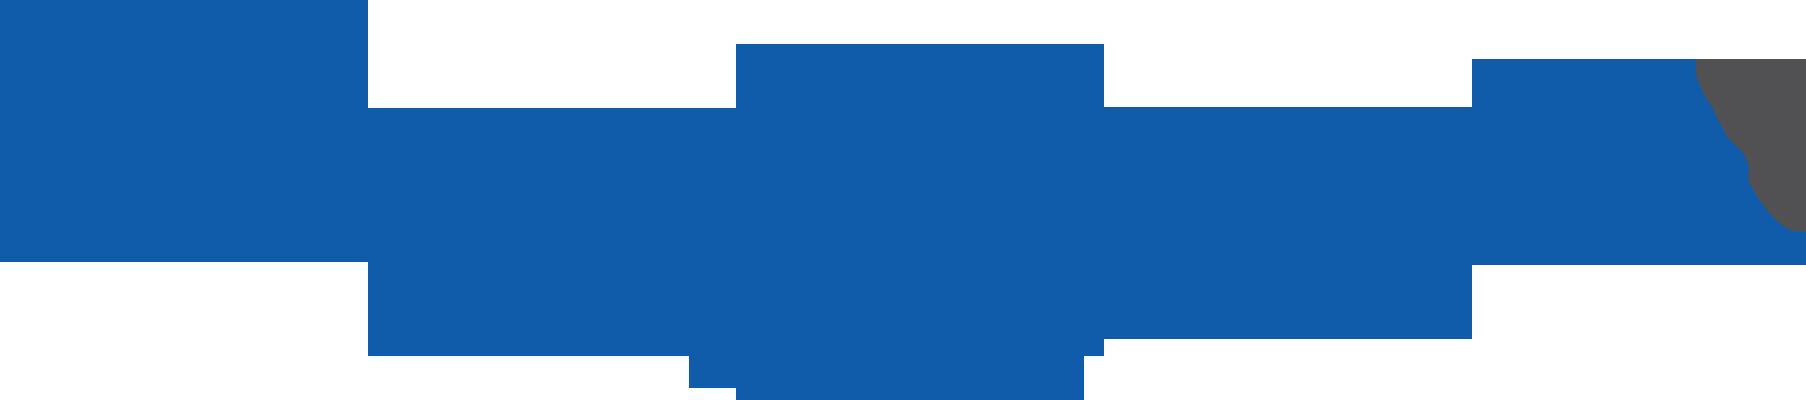 the maritime standard